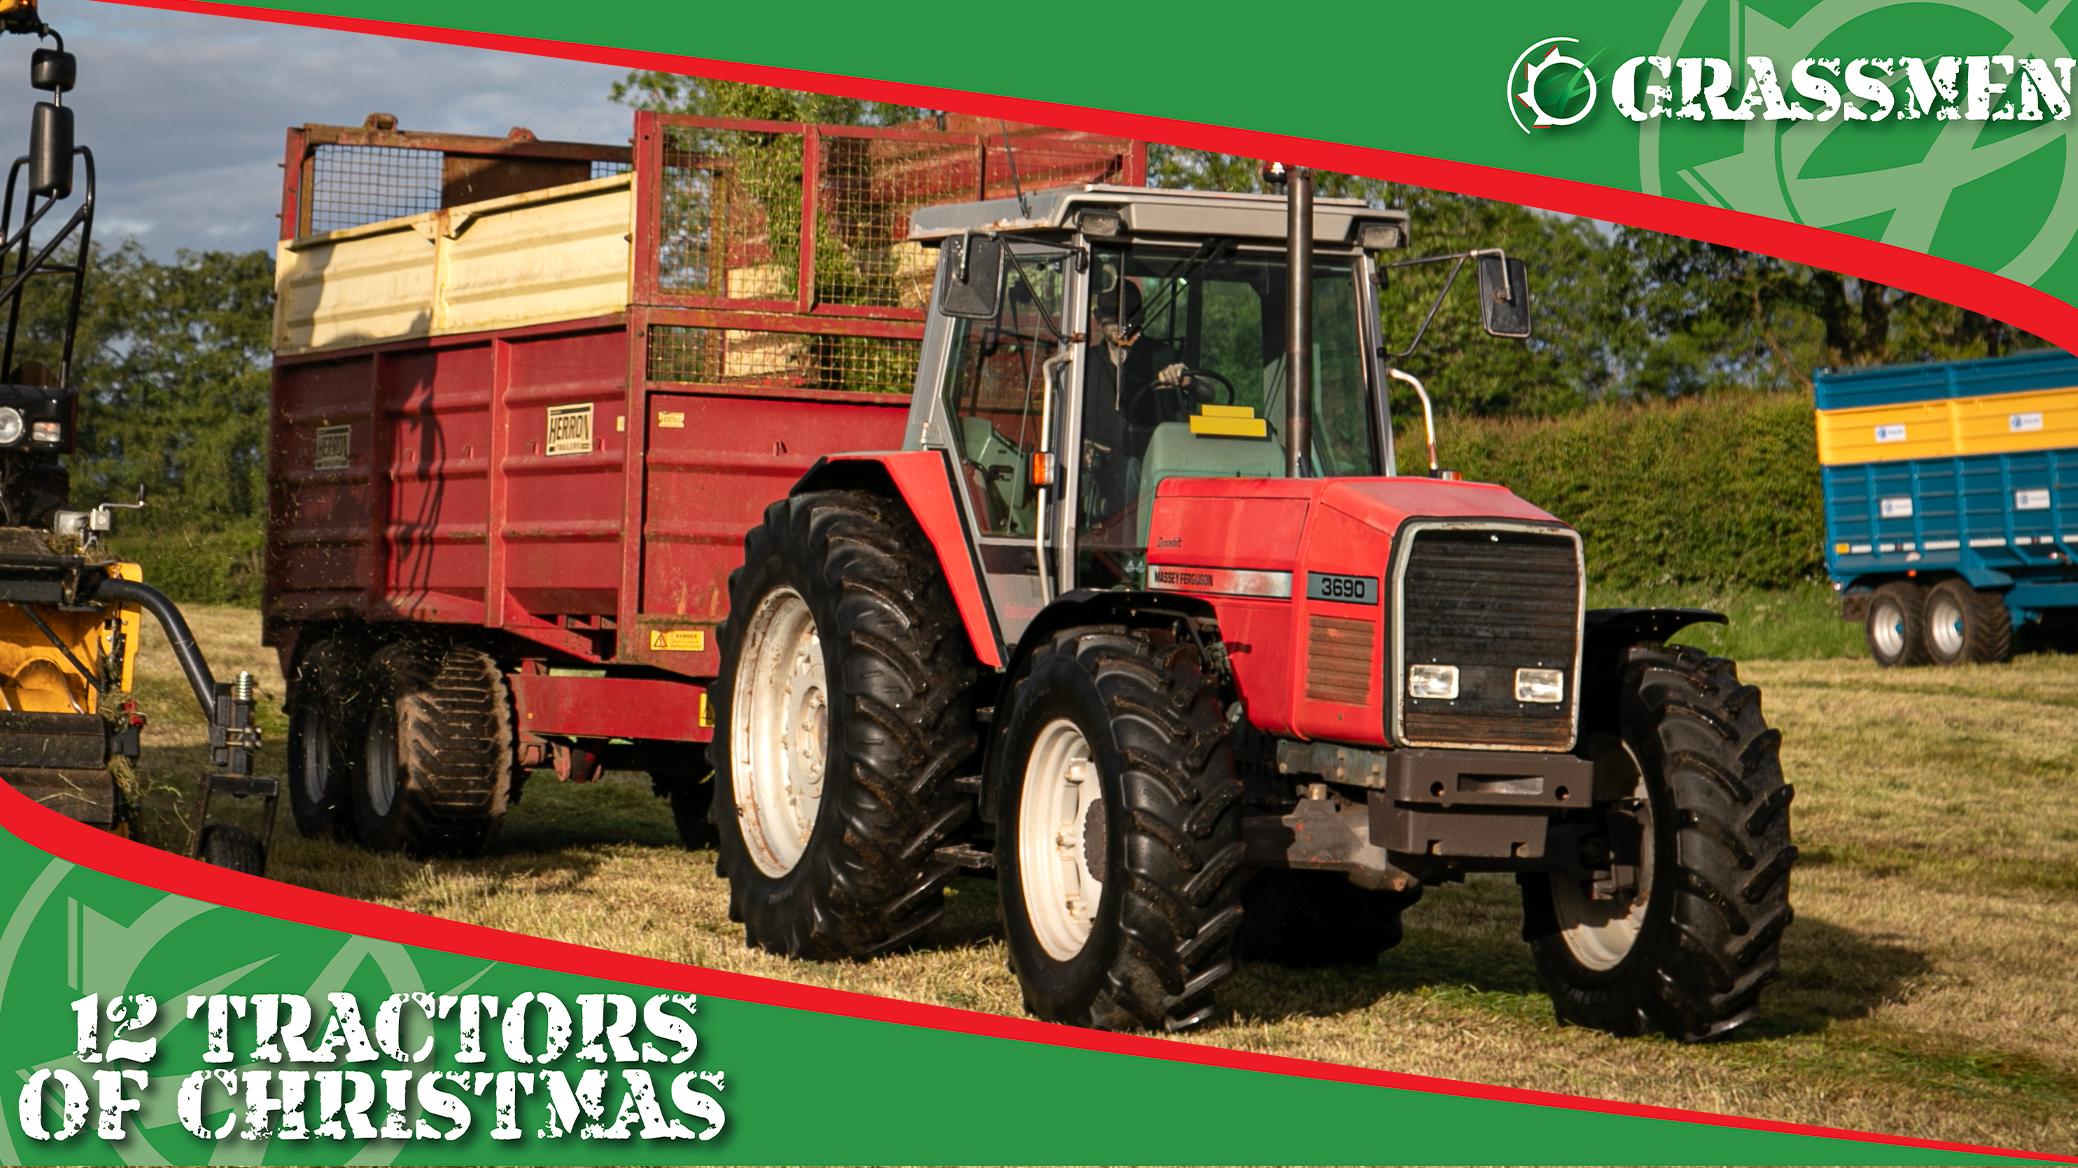 MASSEY FERGUSON 3690 - 12 Tractors of Christmas